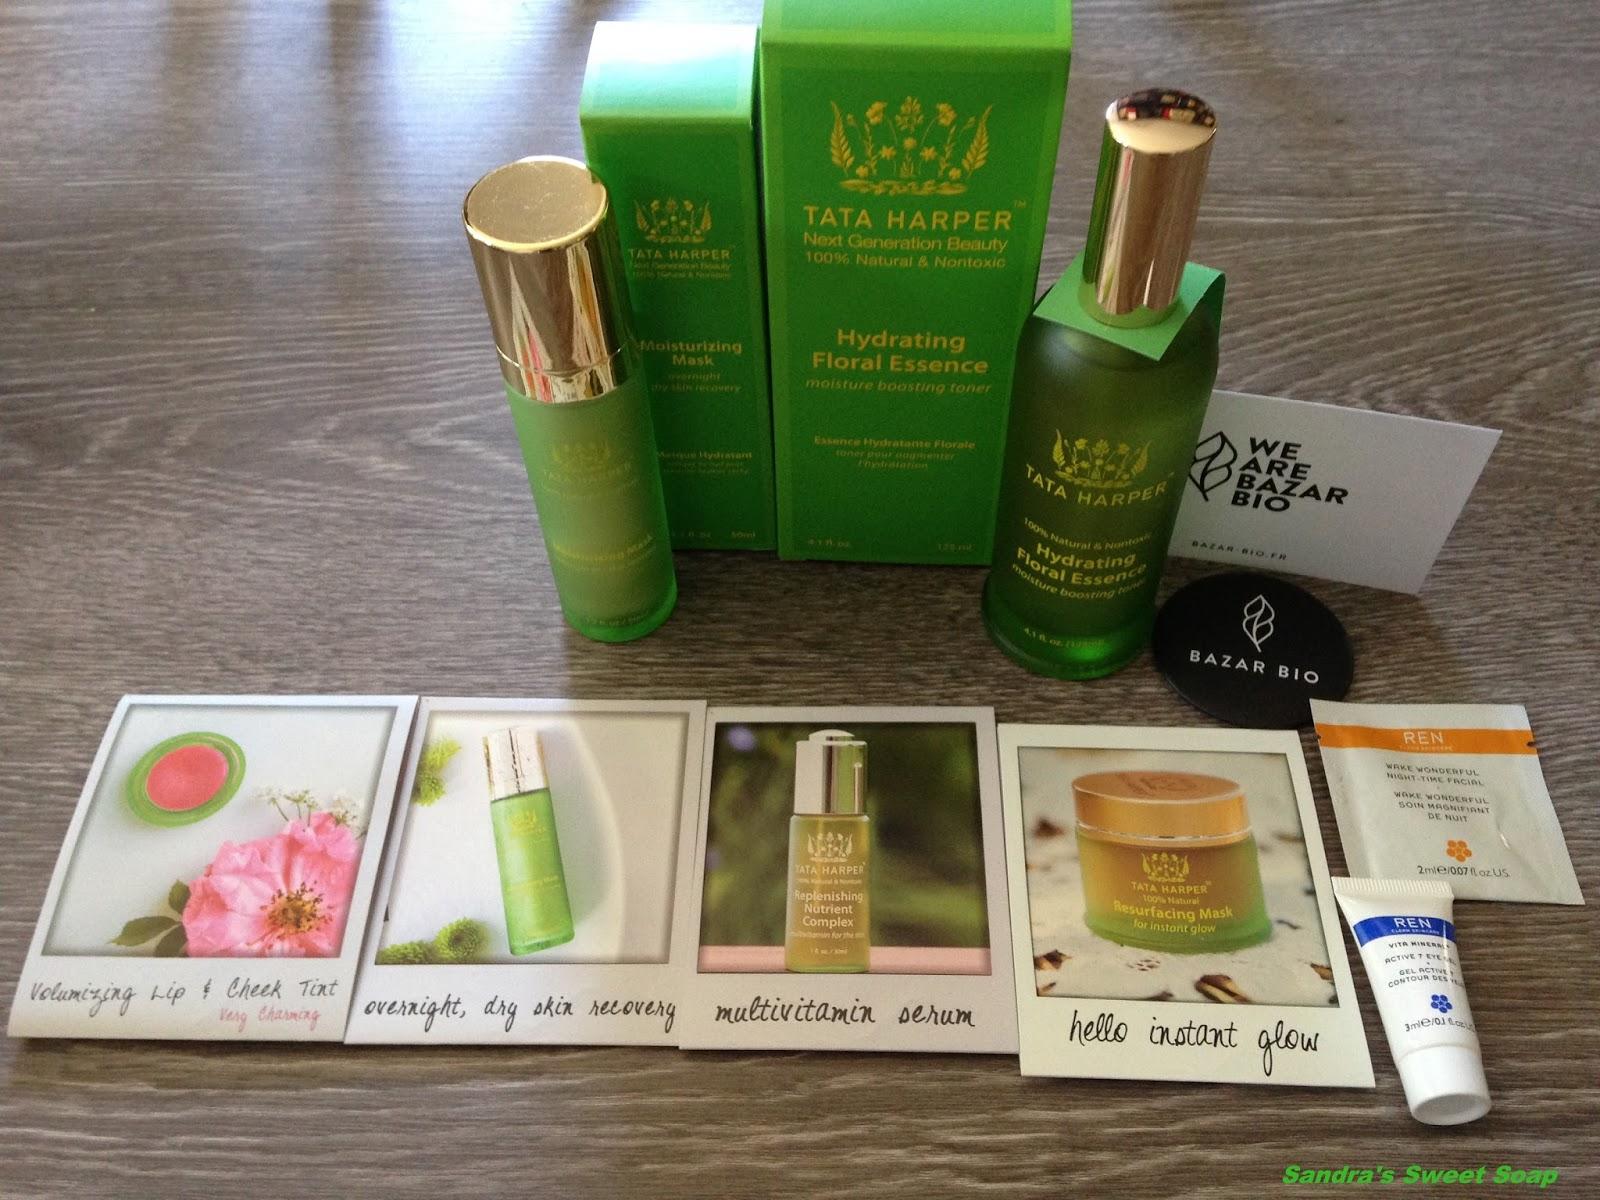 sandra 39 s sweet soap review revue sur l 39 hydrating floral essence de tata harper. Black Bedroom Furniture Sets. Home Design Ideas